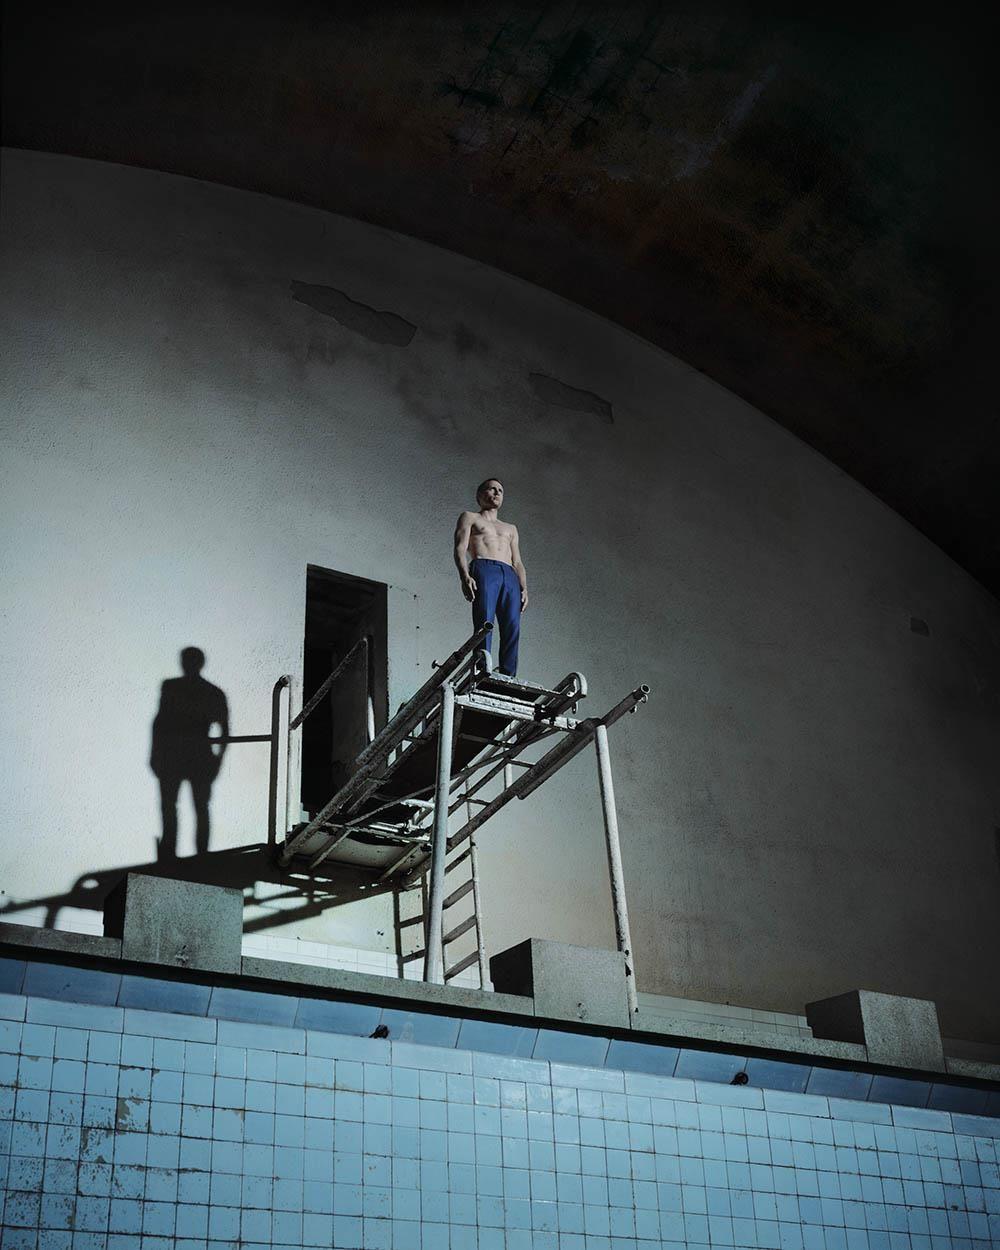 Andreas Mühe Germanys Most Disruptive Photographer Photographer Pictures Photo Photographer